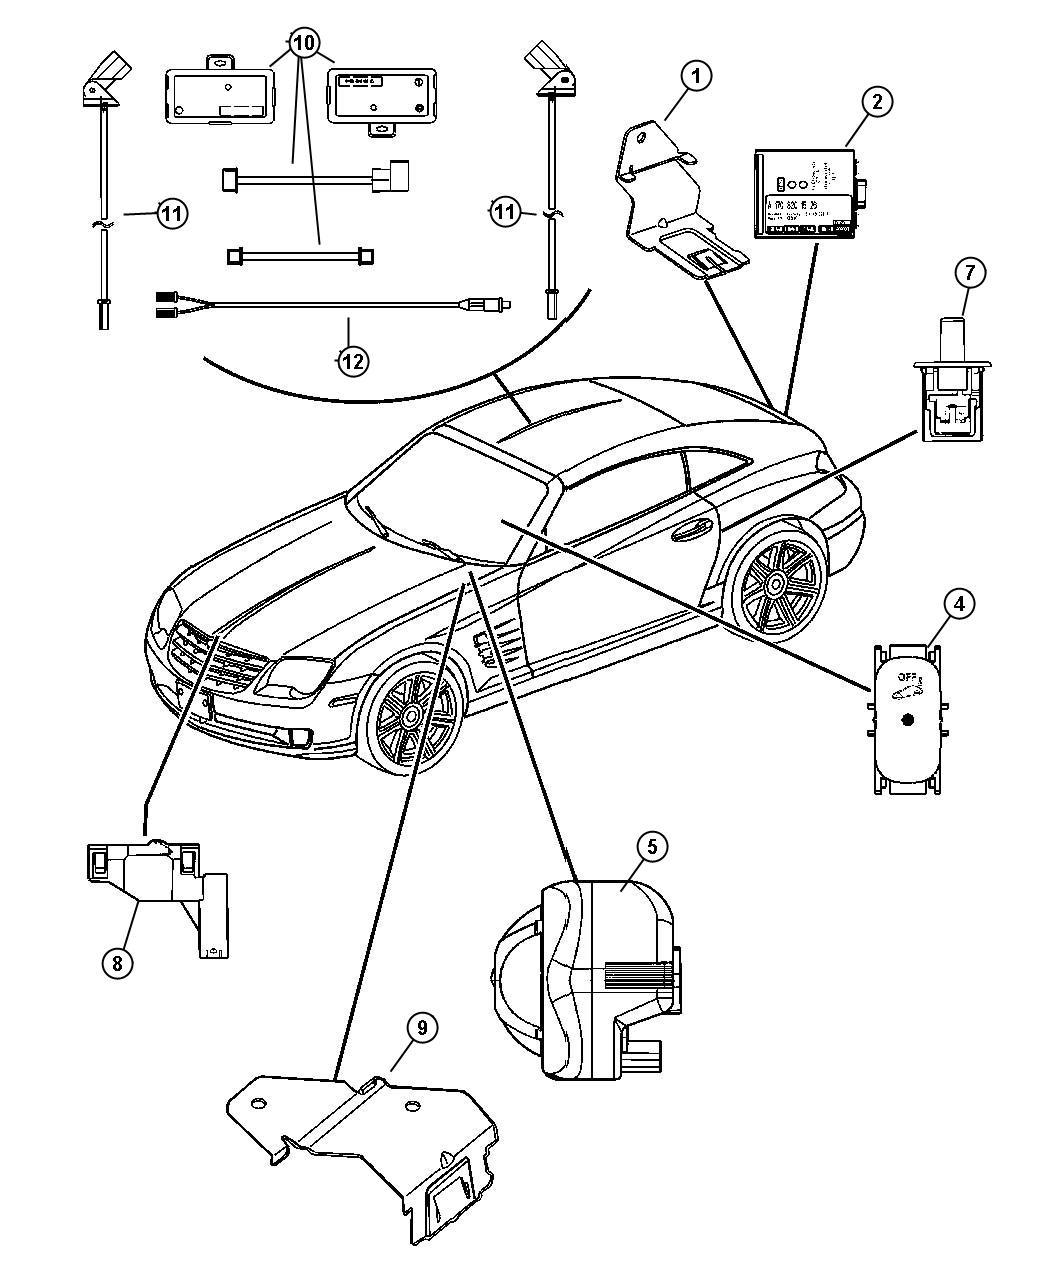 Diagram Dei 514n Alarm Horn Diagram Full Version Hd